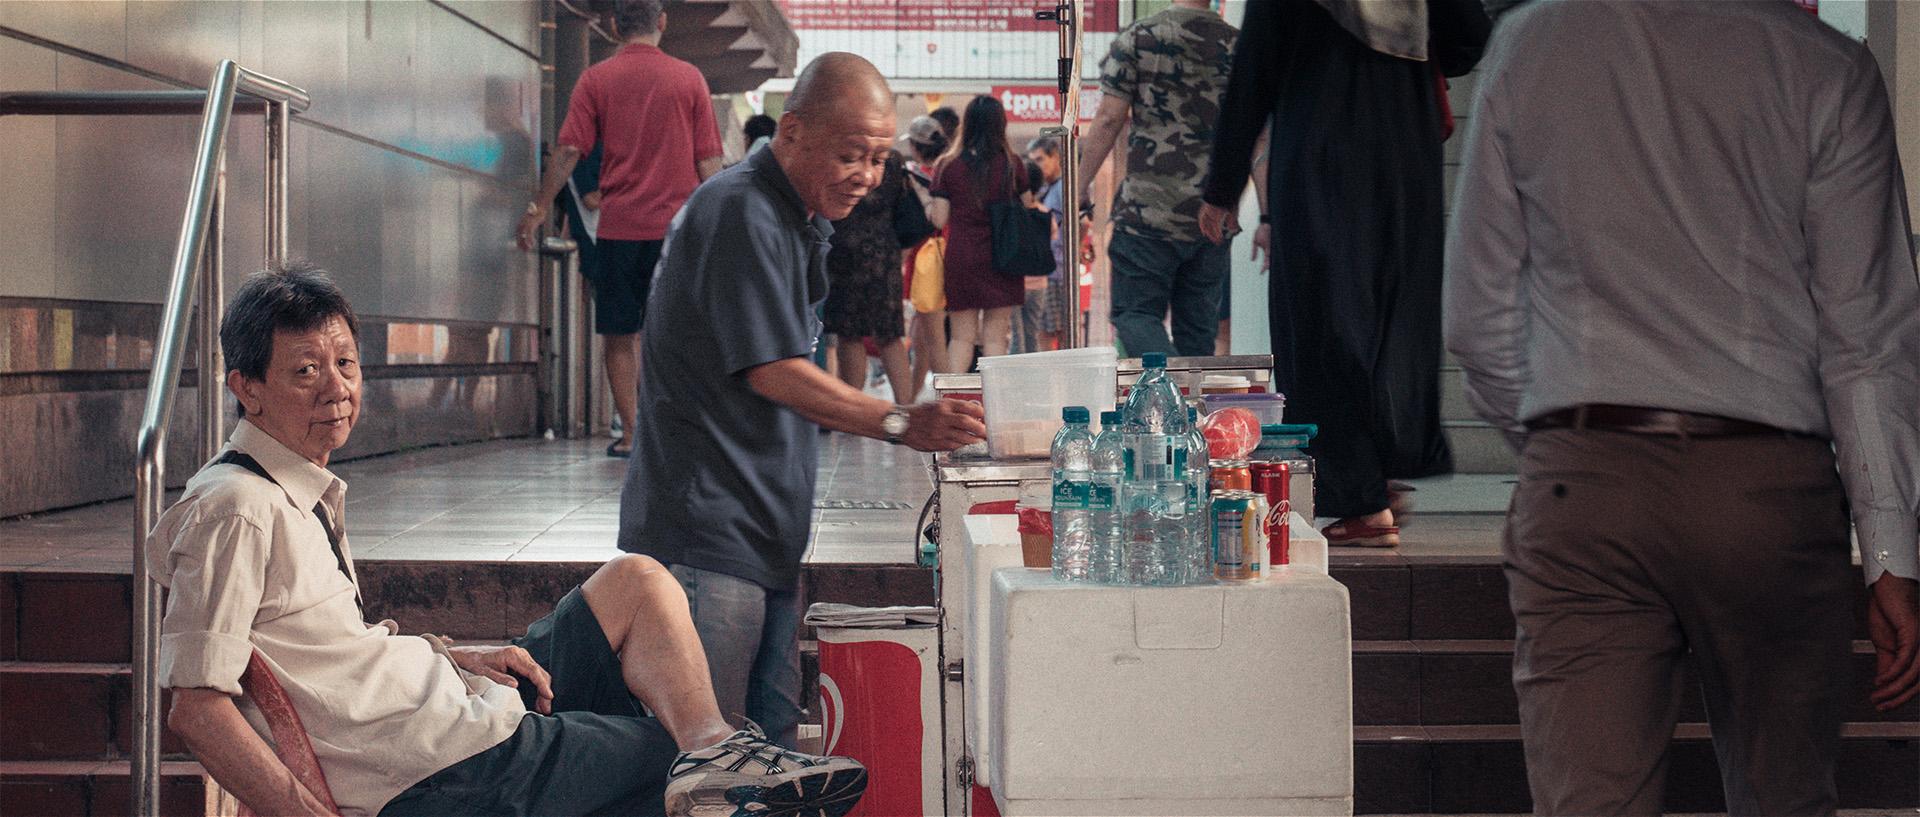 Nikko Pascua Travel photography Singapore_01138.jpg